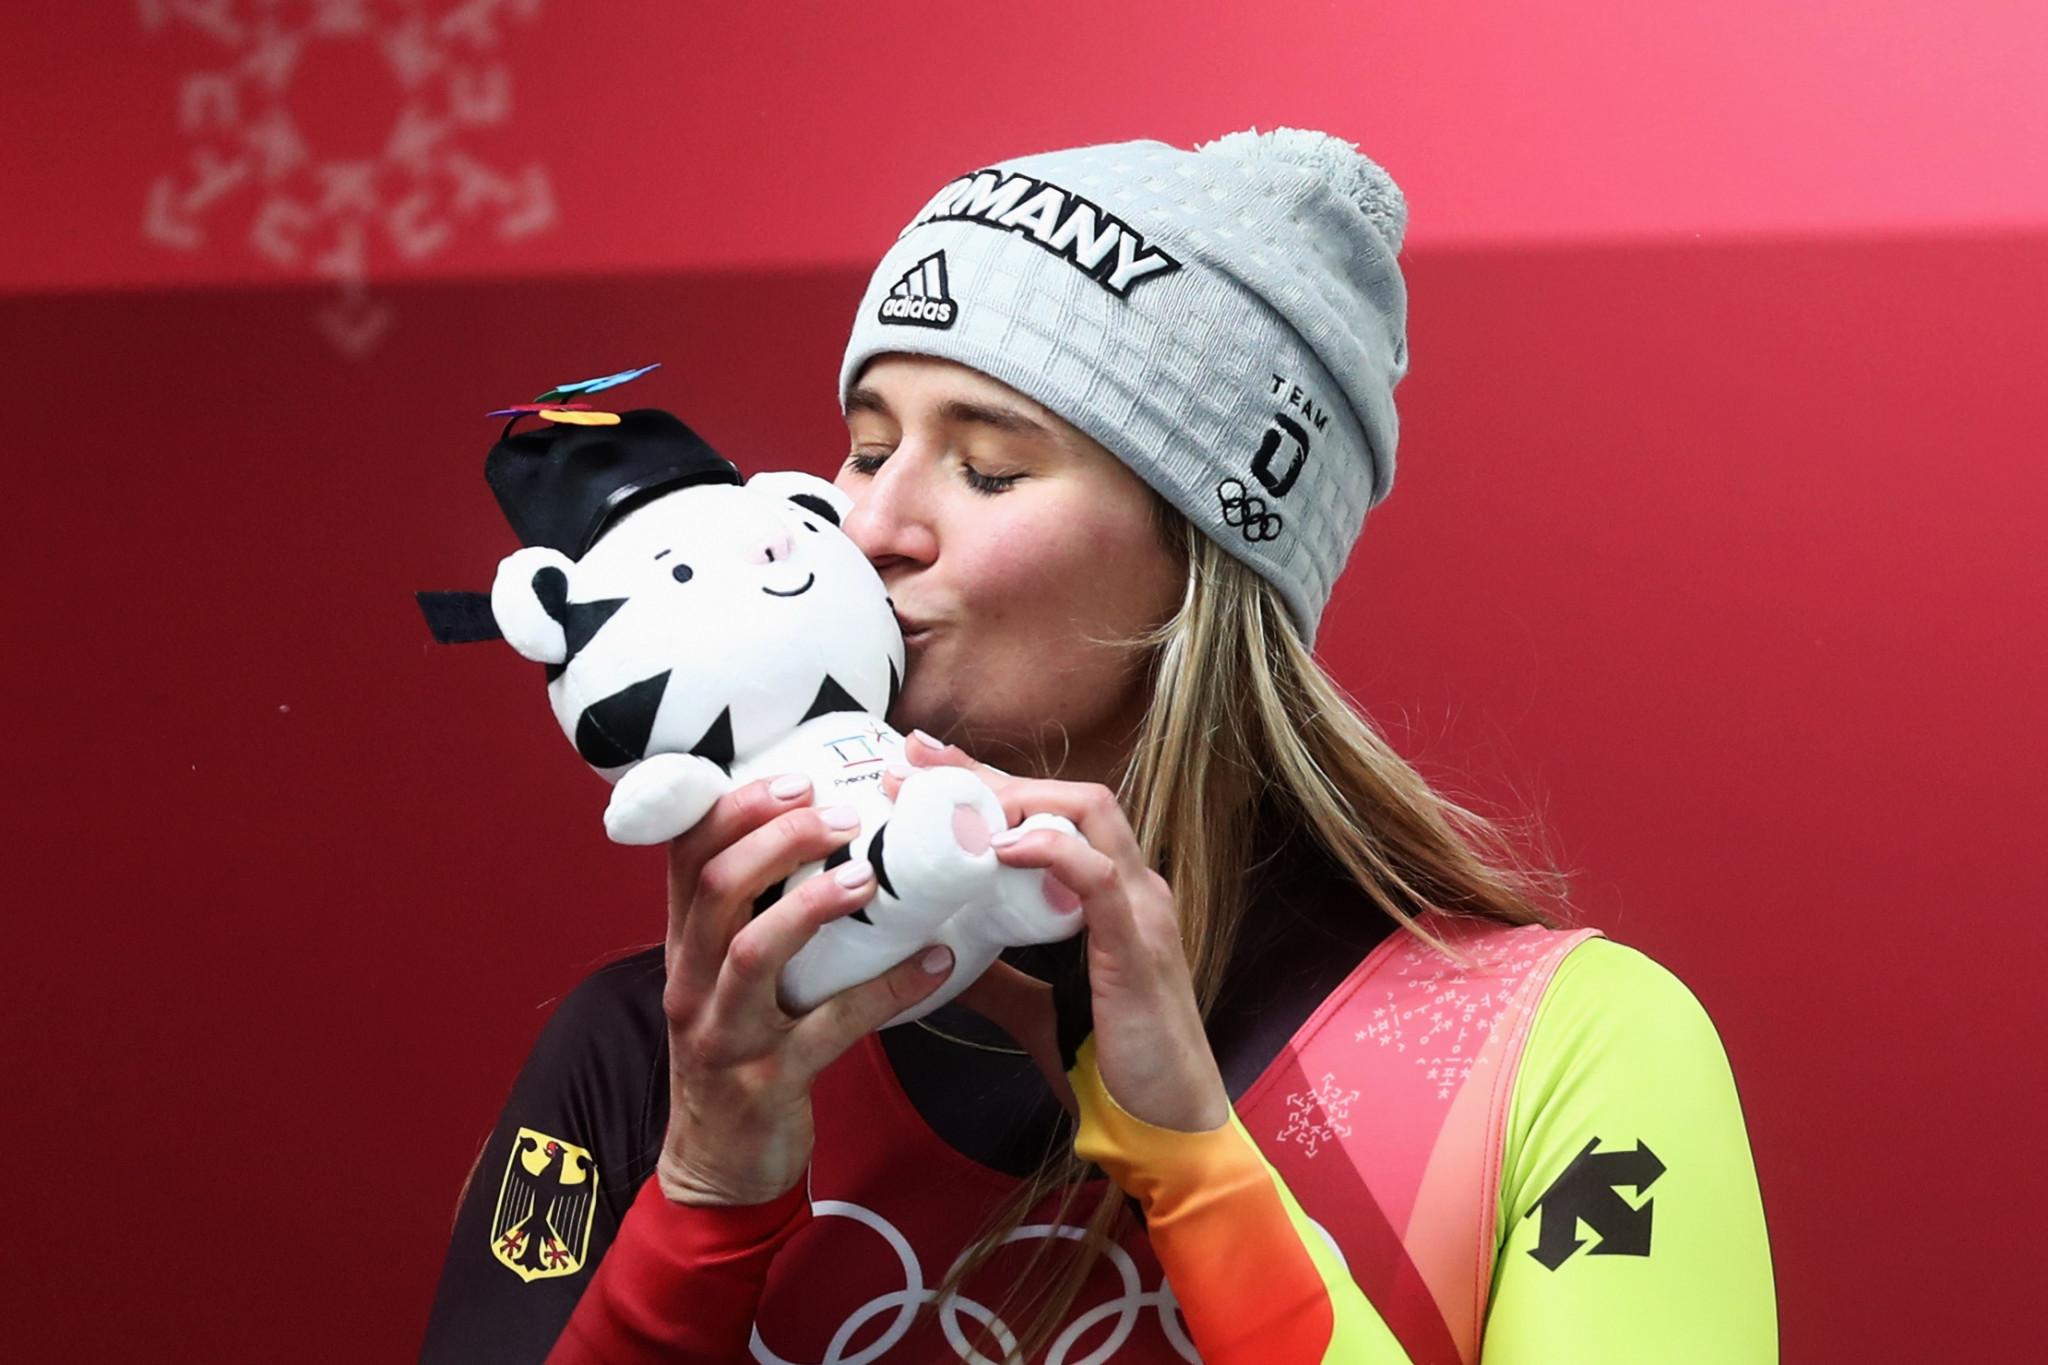 Natalie Geisenberger celebrates her luge victory ©Getty Images